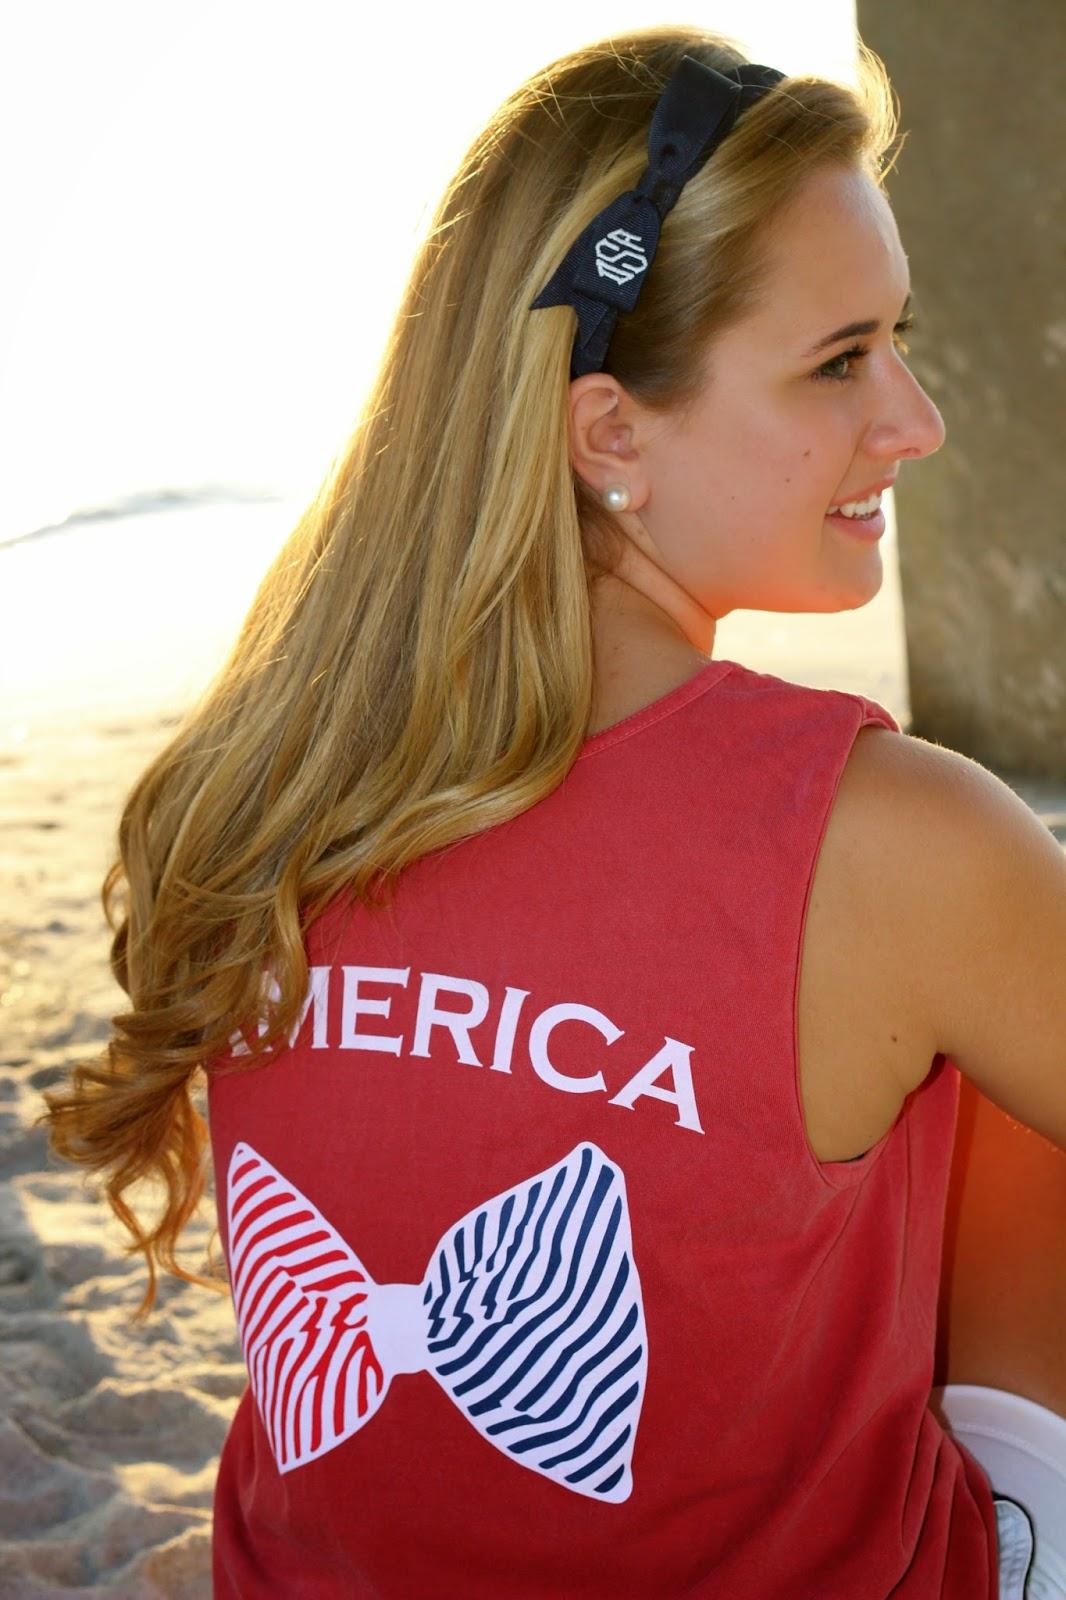 america tank tops summer style